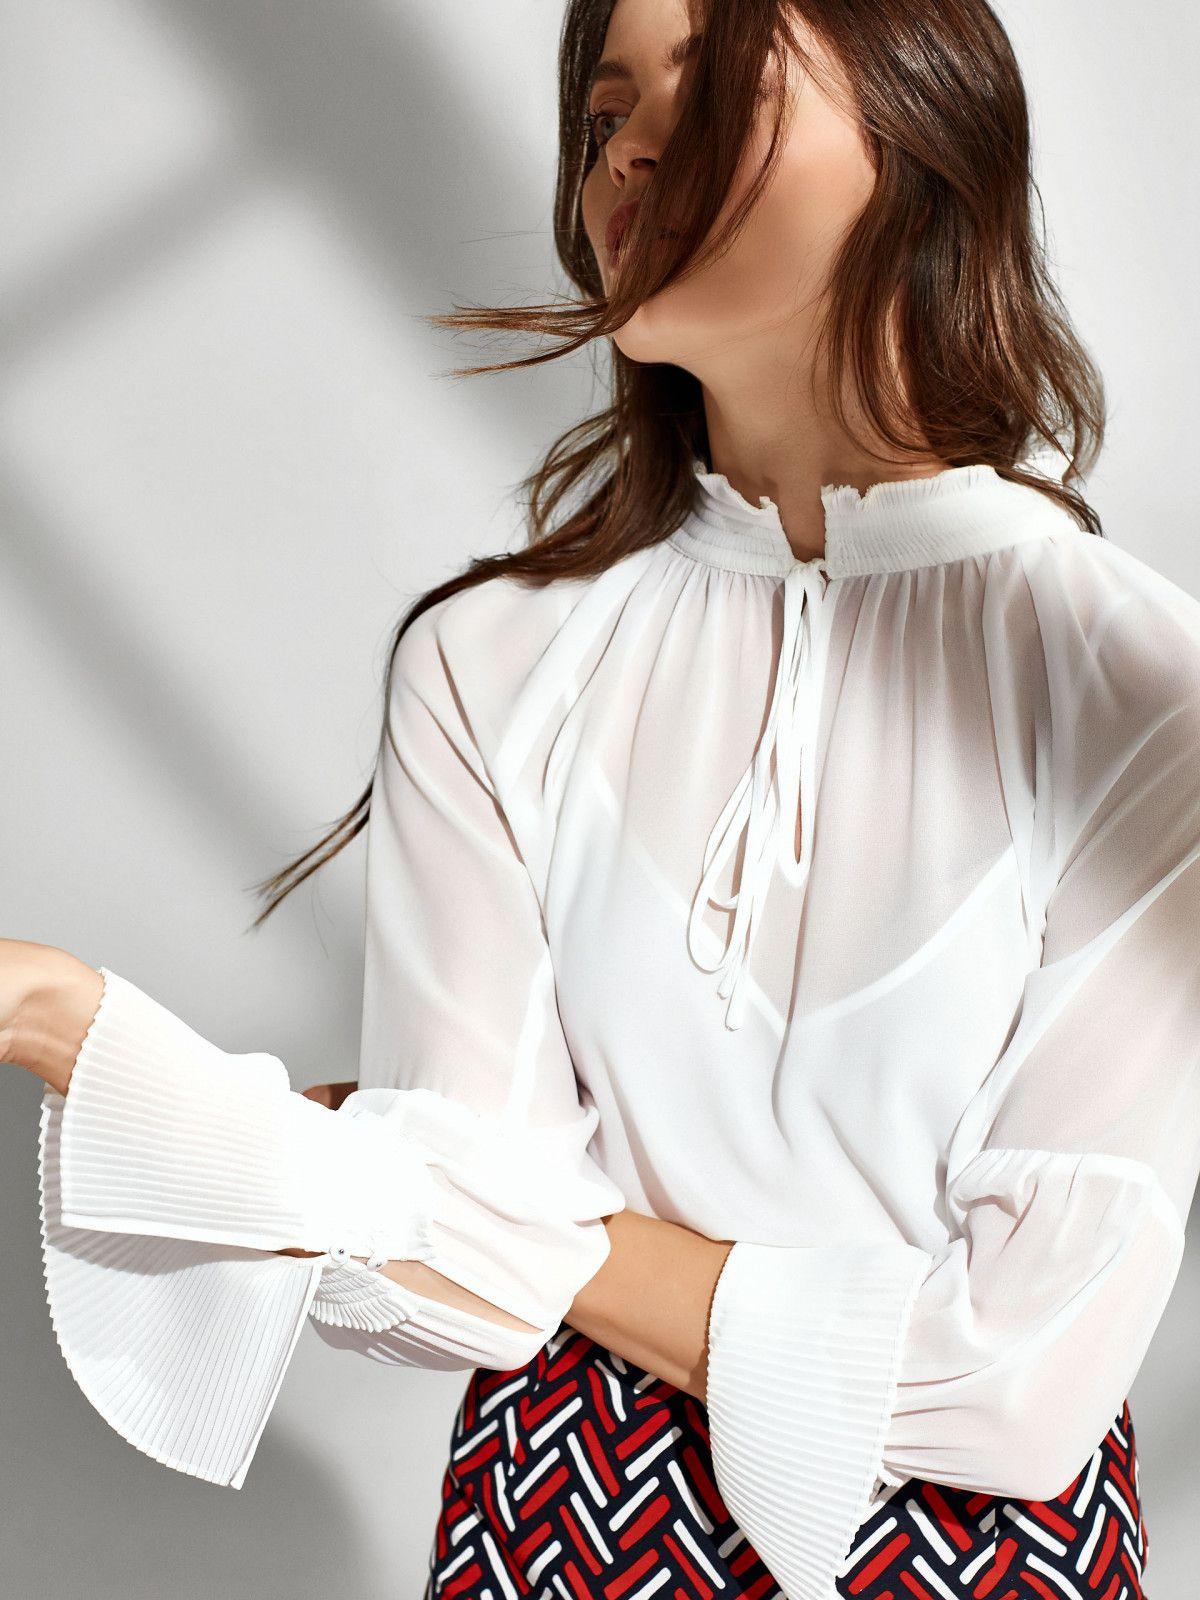 8c927a26dc Taranko Spring 2019 White shirt Białe Koszule